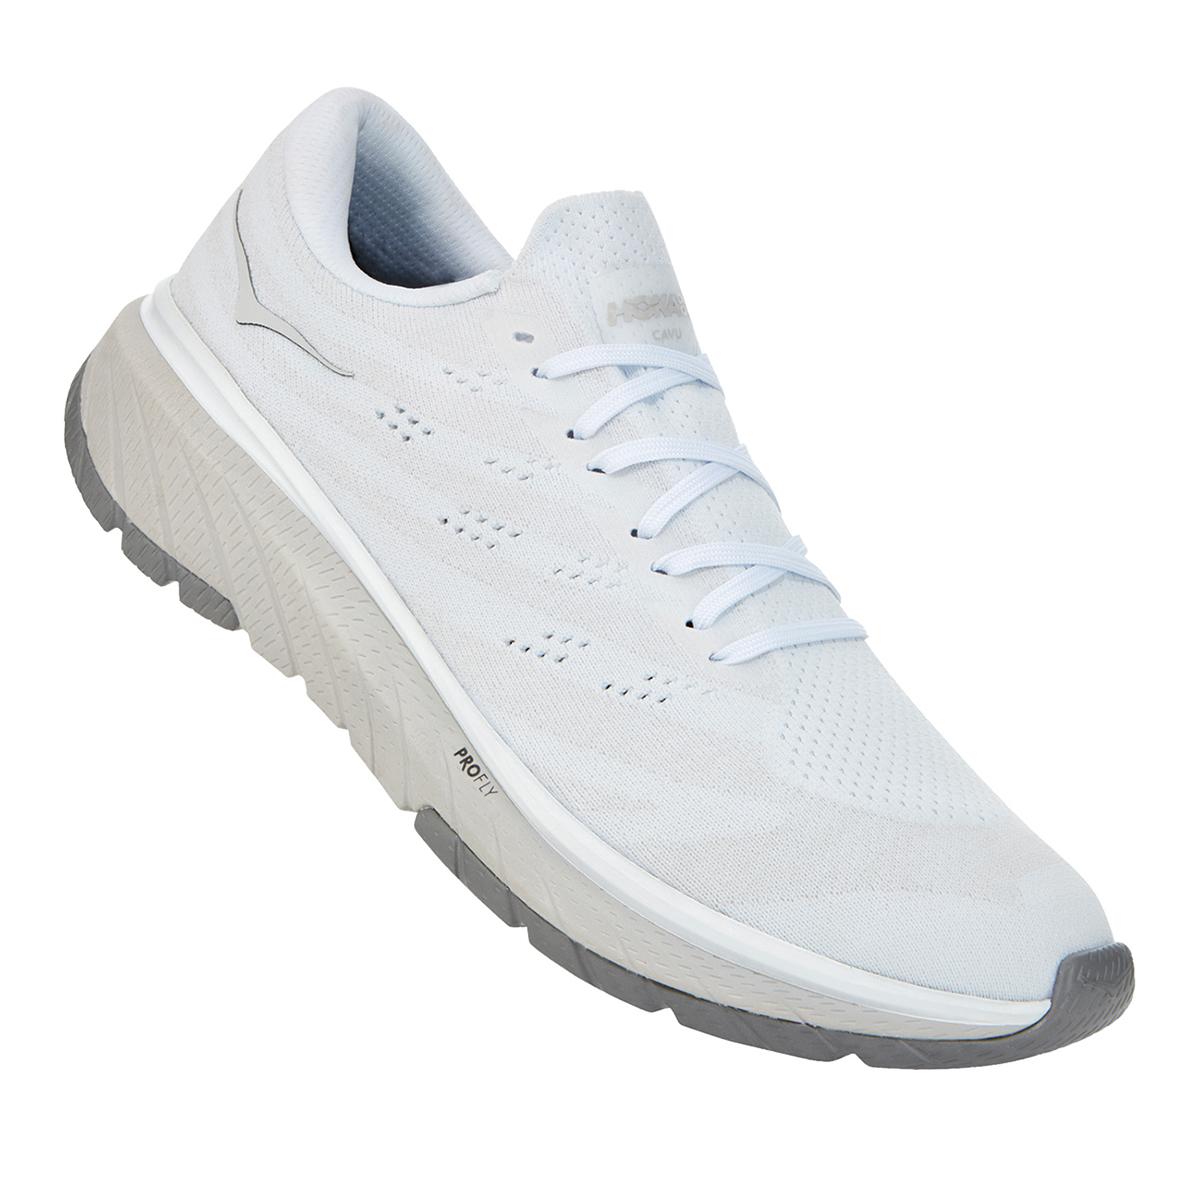 Men's Hoka One One Cavu 3 Running Shoe - Color: White/Nimbus Cloud - Size: 7 - Width: Regular, White/Nimbus Cloud, large, image 5